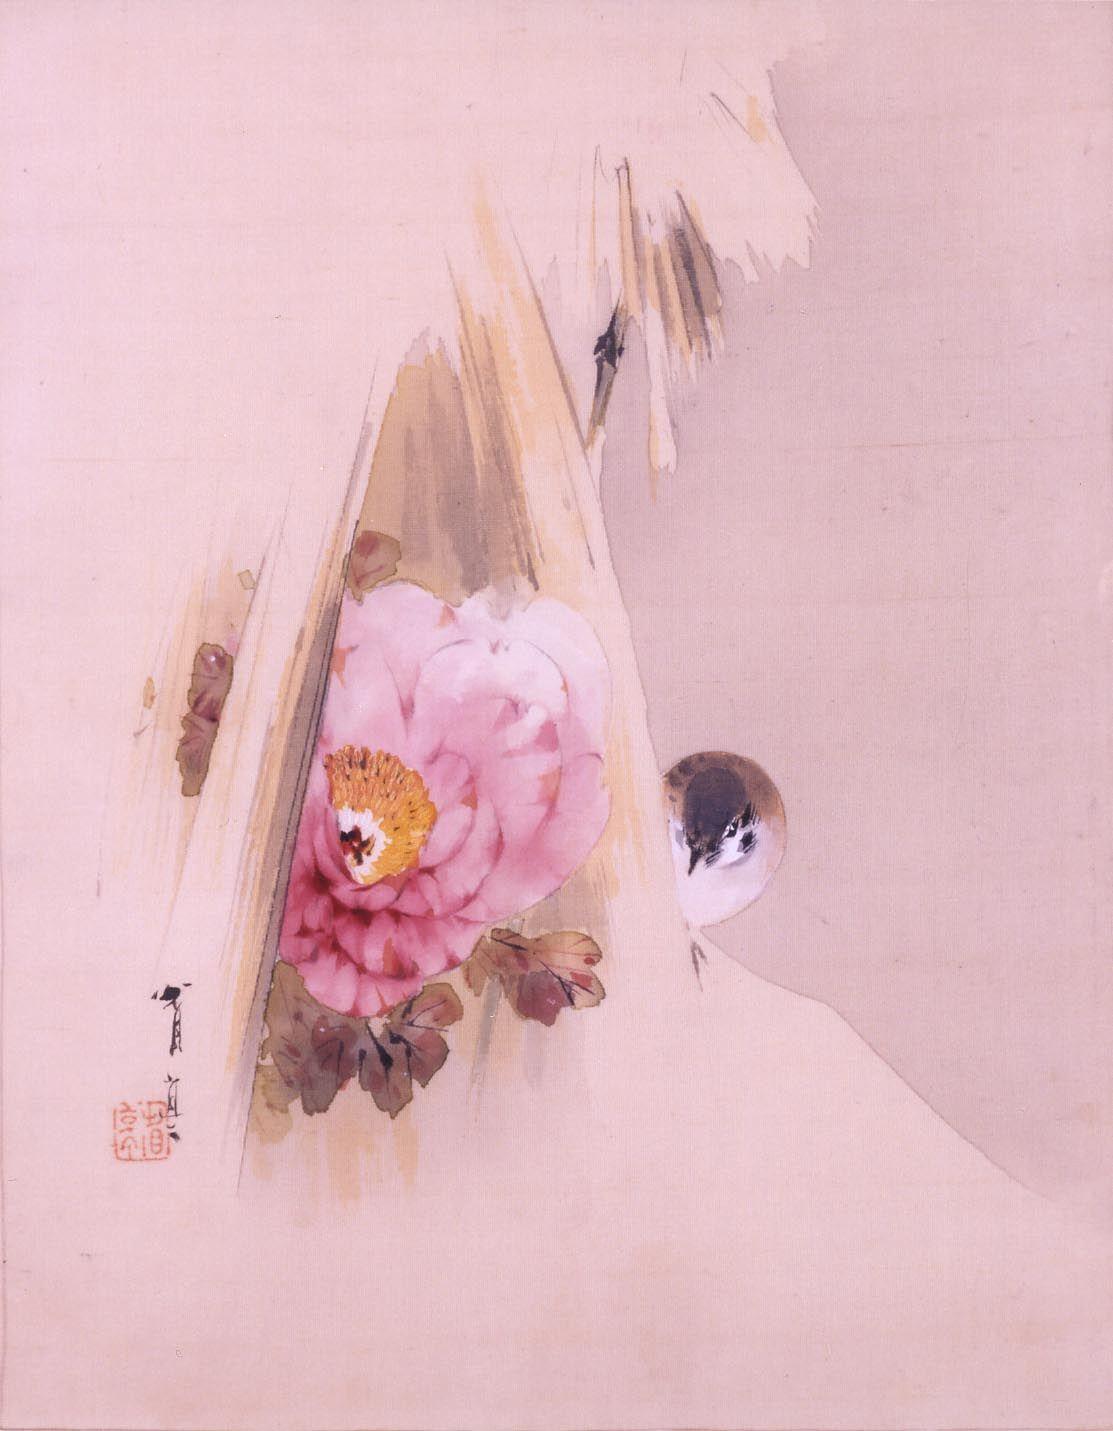 渡辺省亭の画像 p1_24